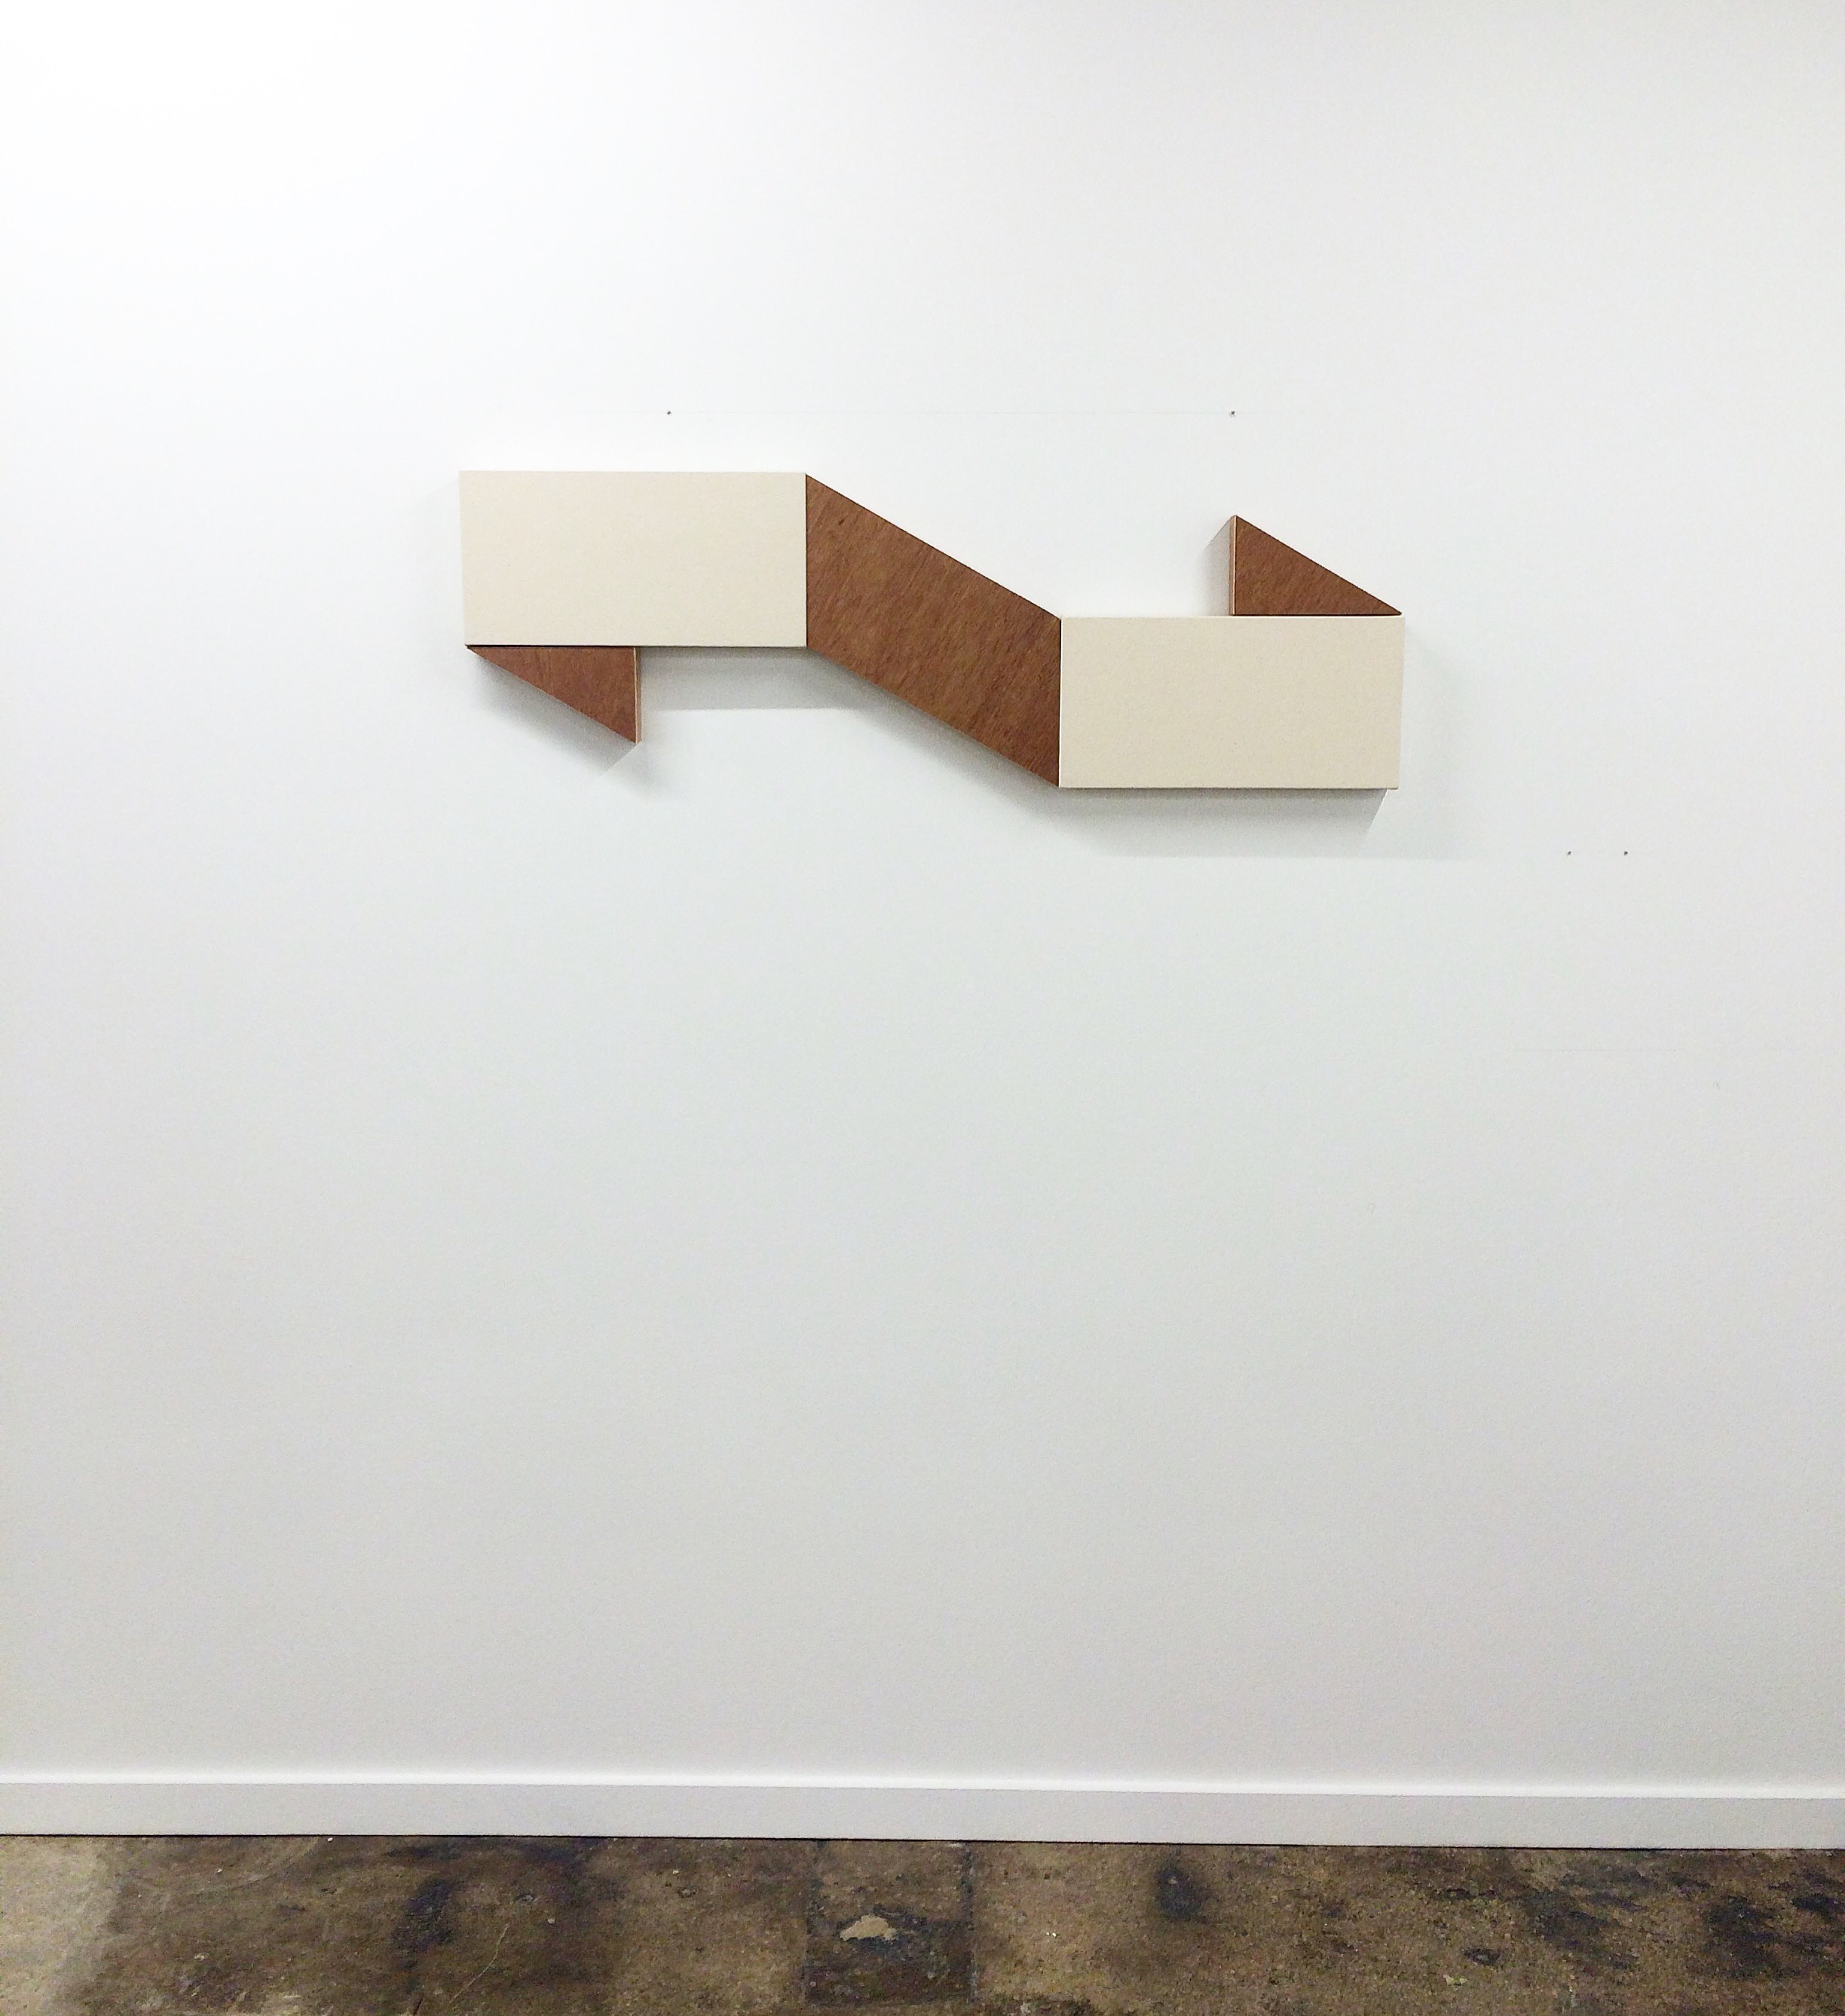 Robert Taite, Untitled